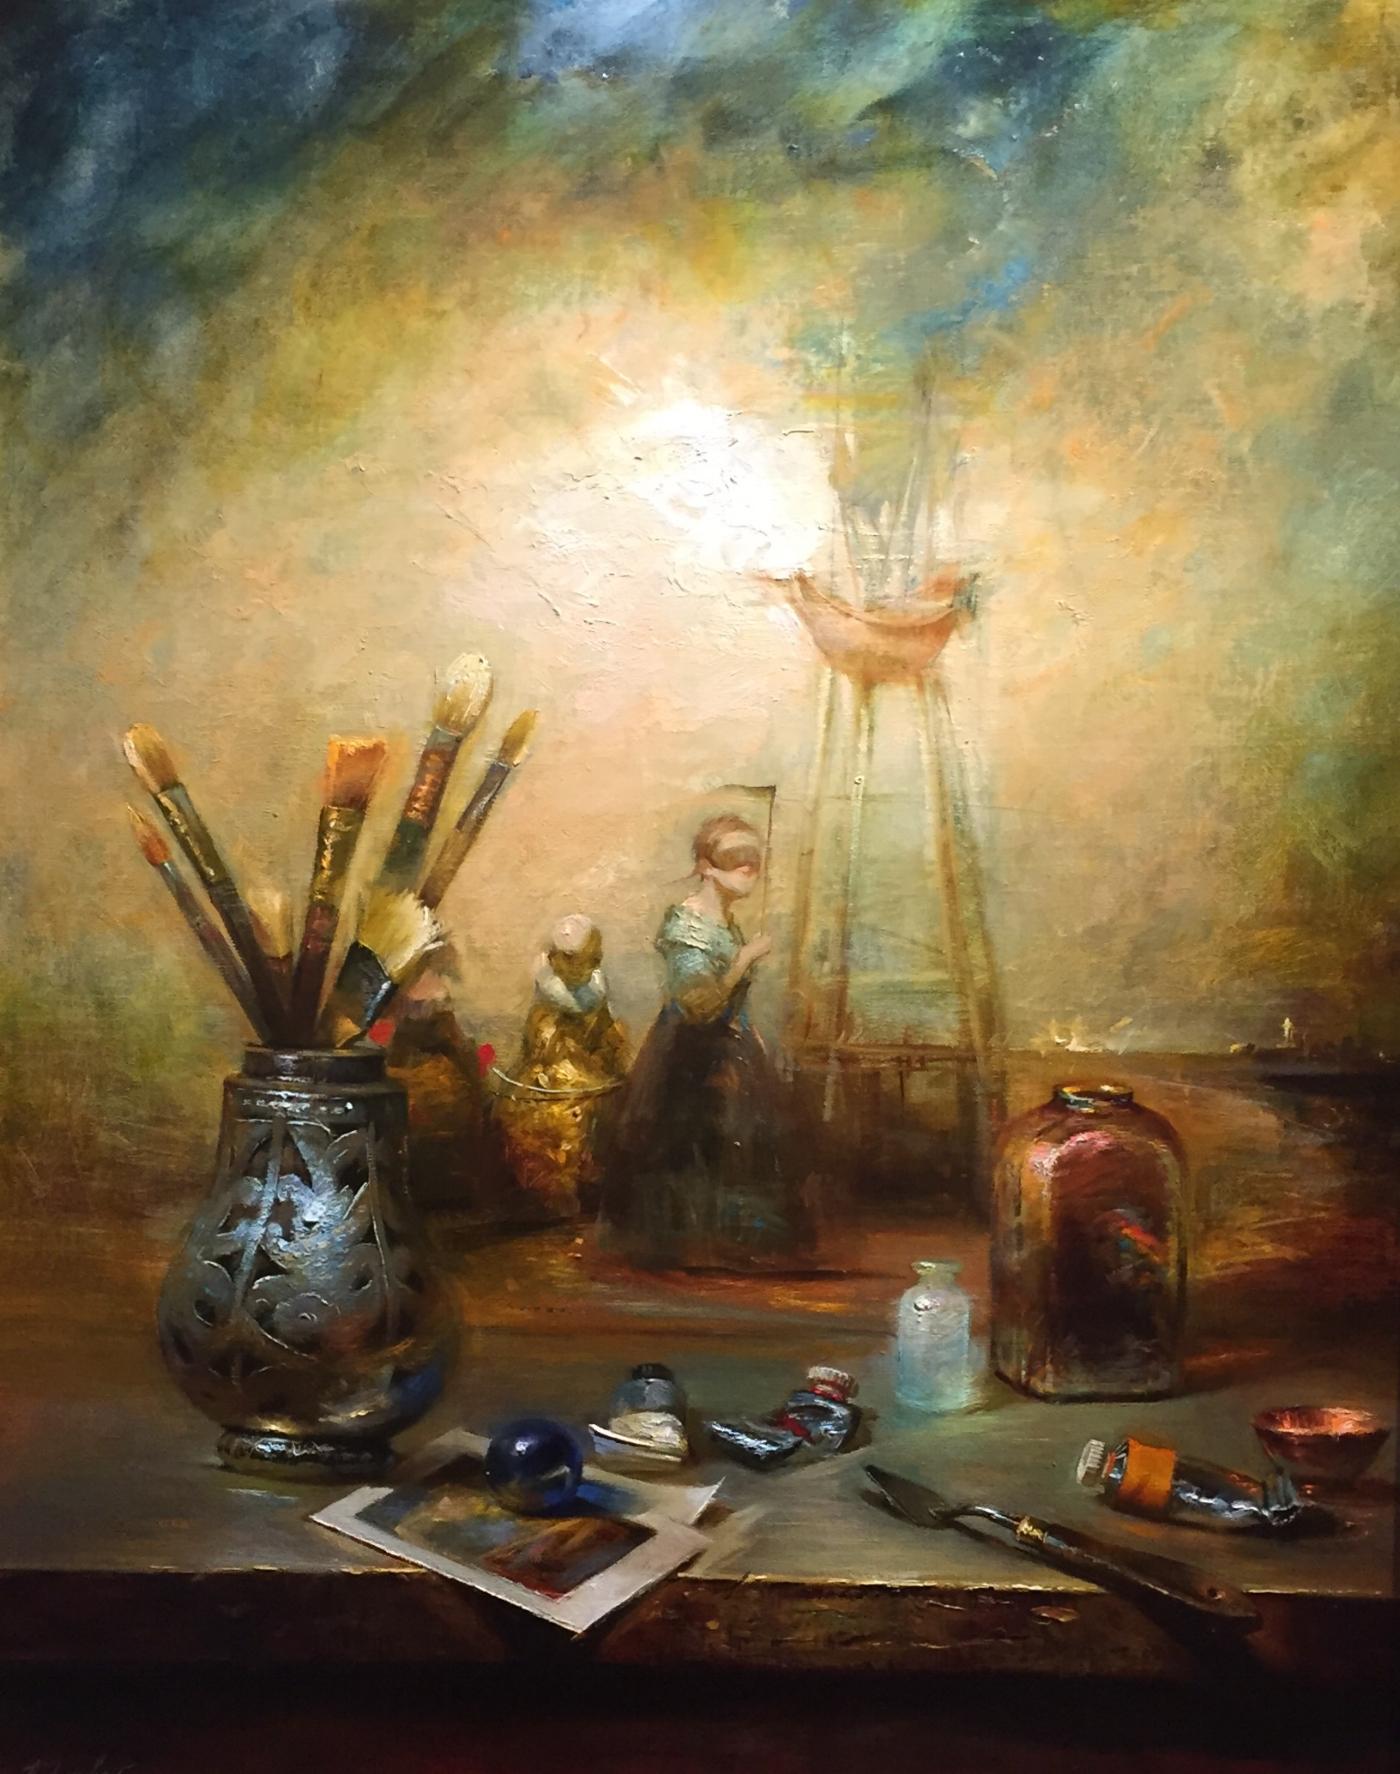 Painter's Inspiration (30x24)